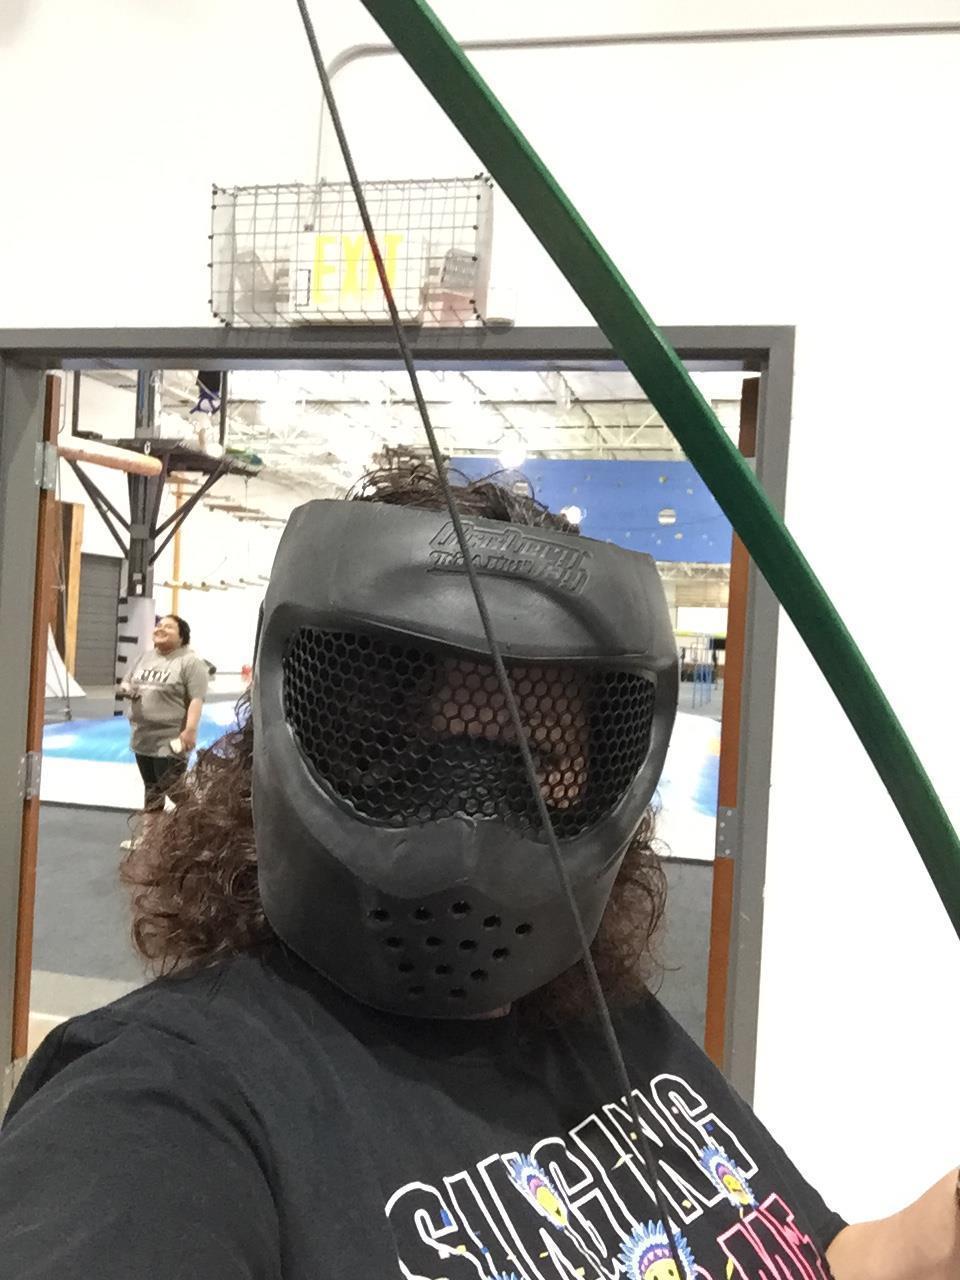 Mrs. Hammock in her protective mask